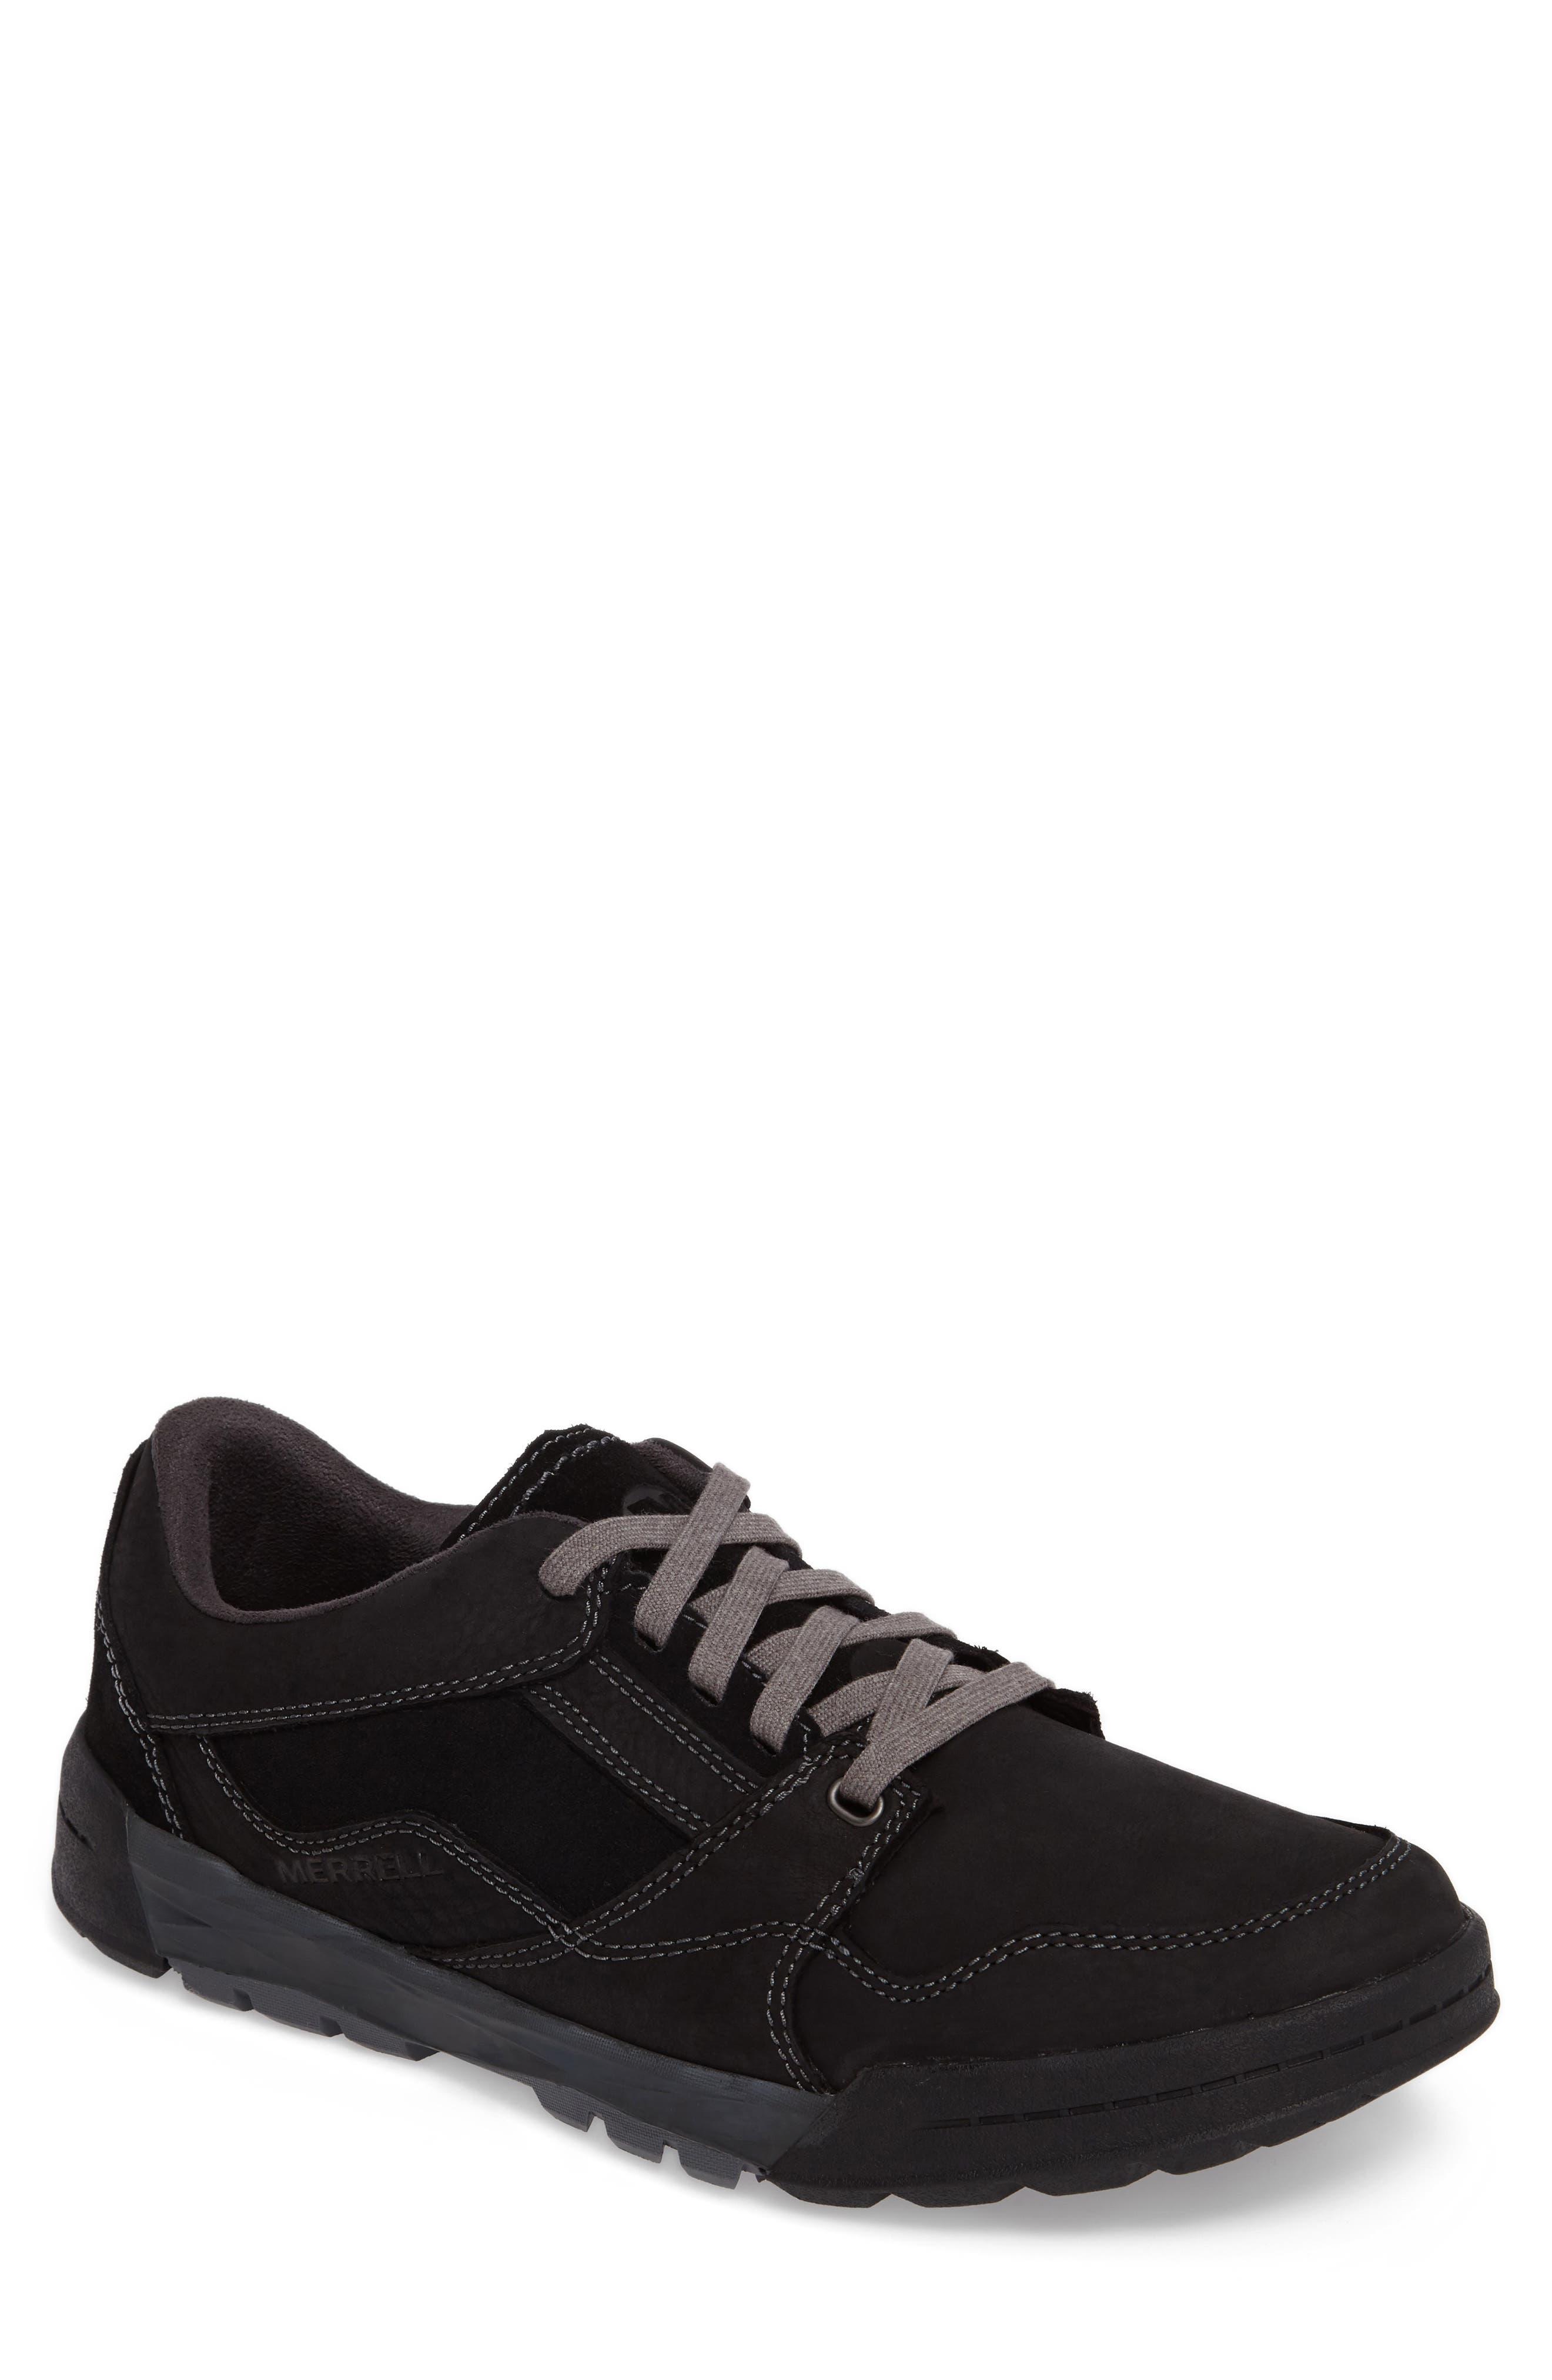 Merrell Berner Sneaker (Men)